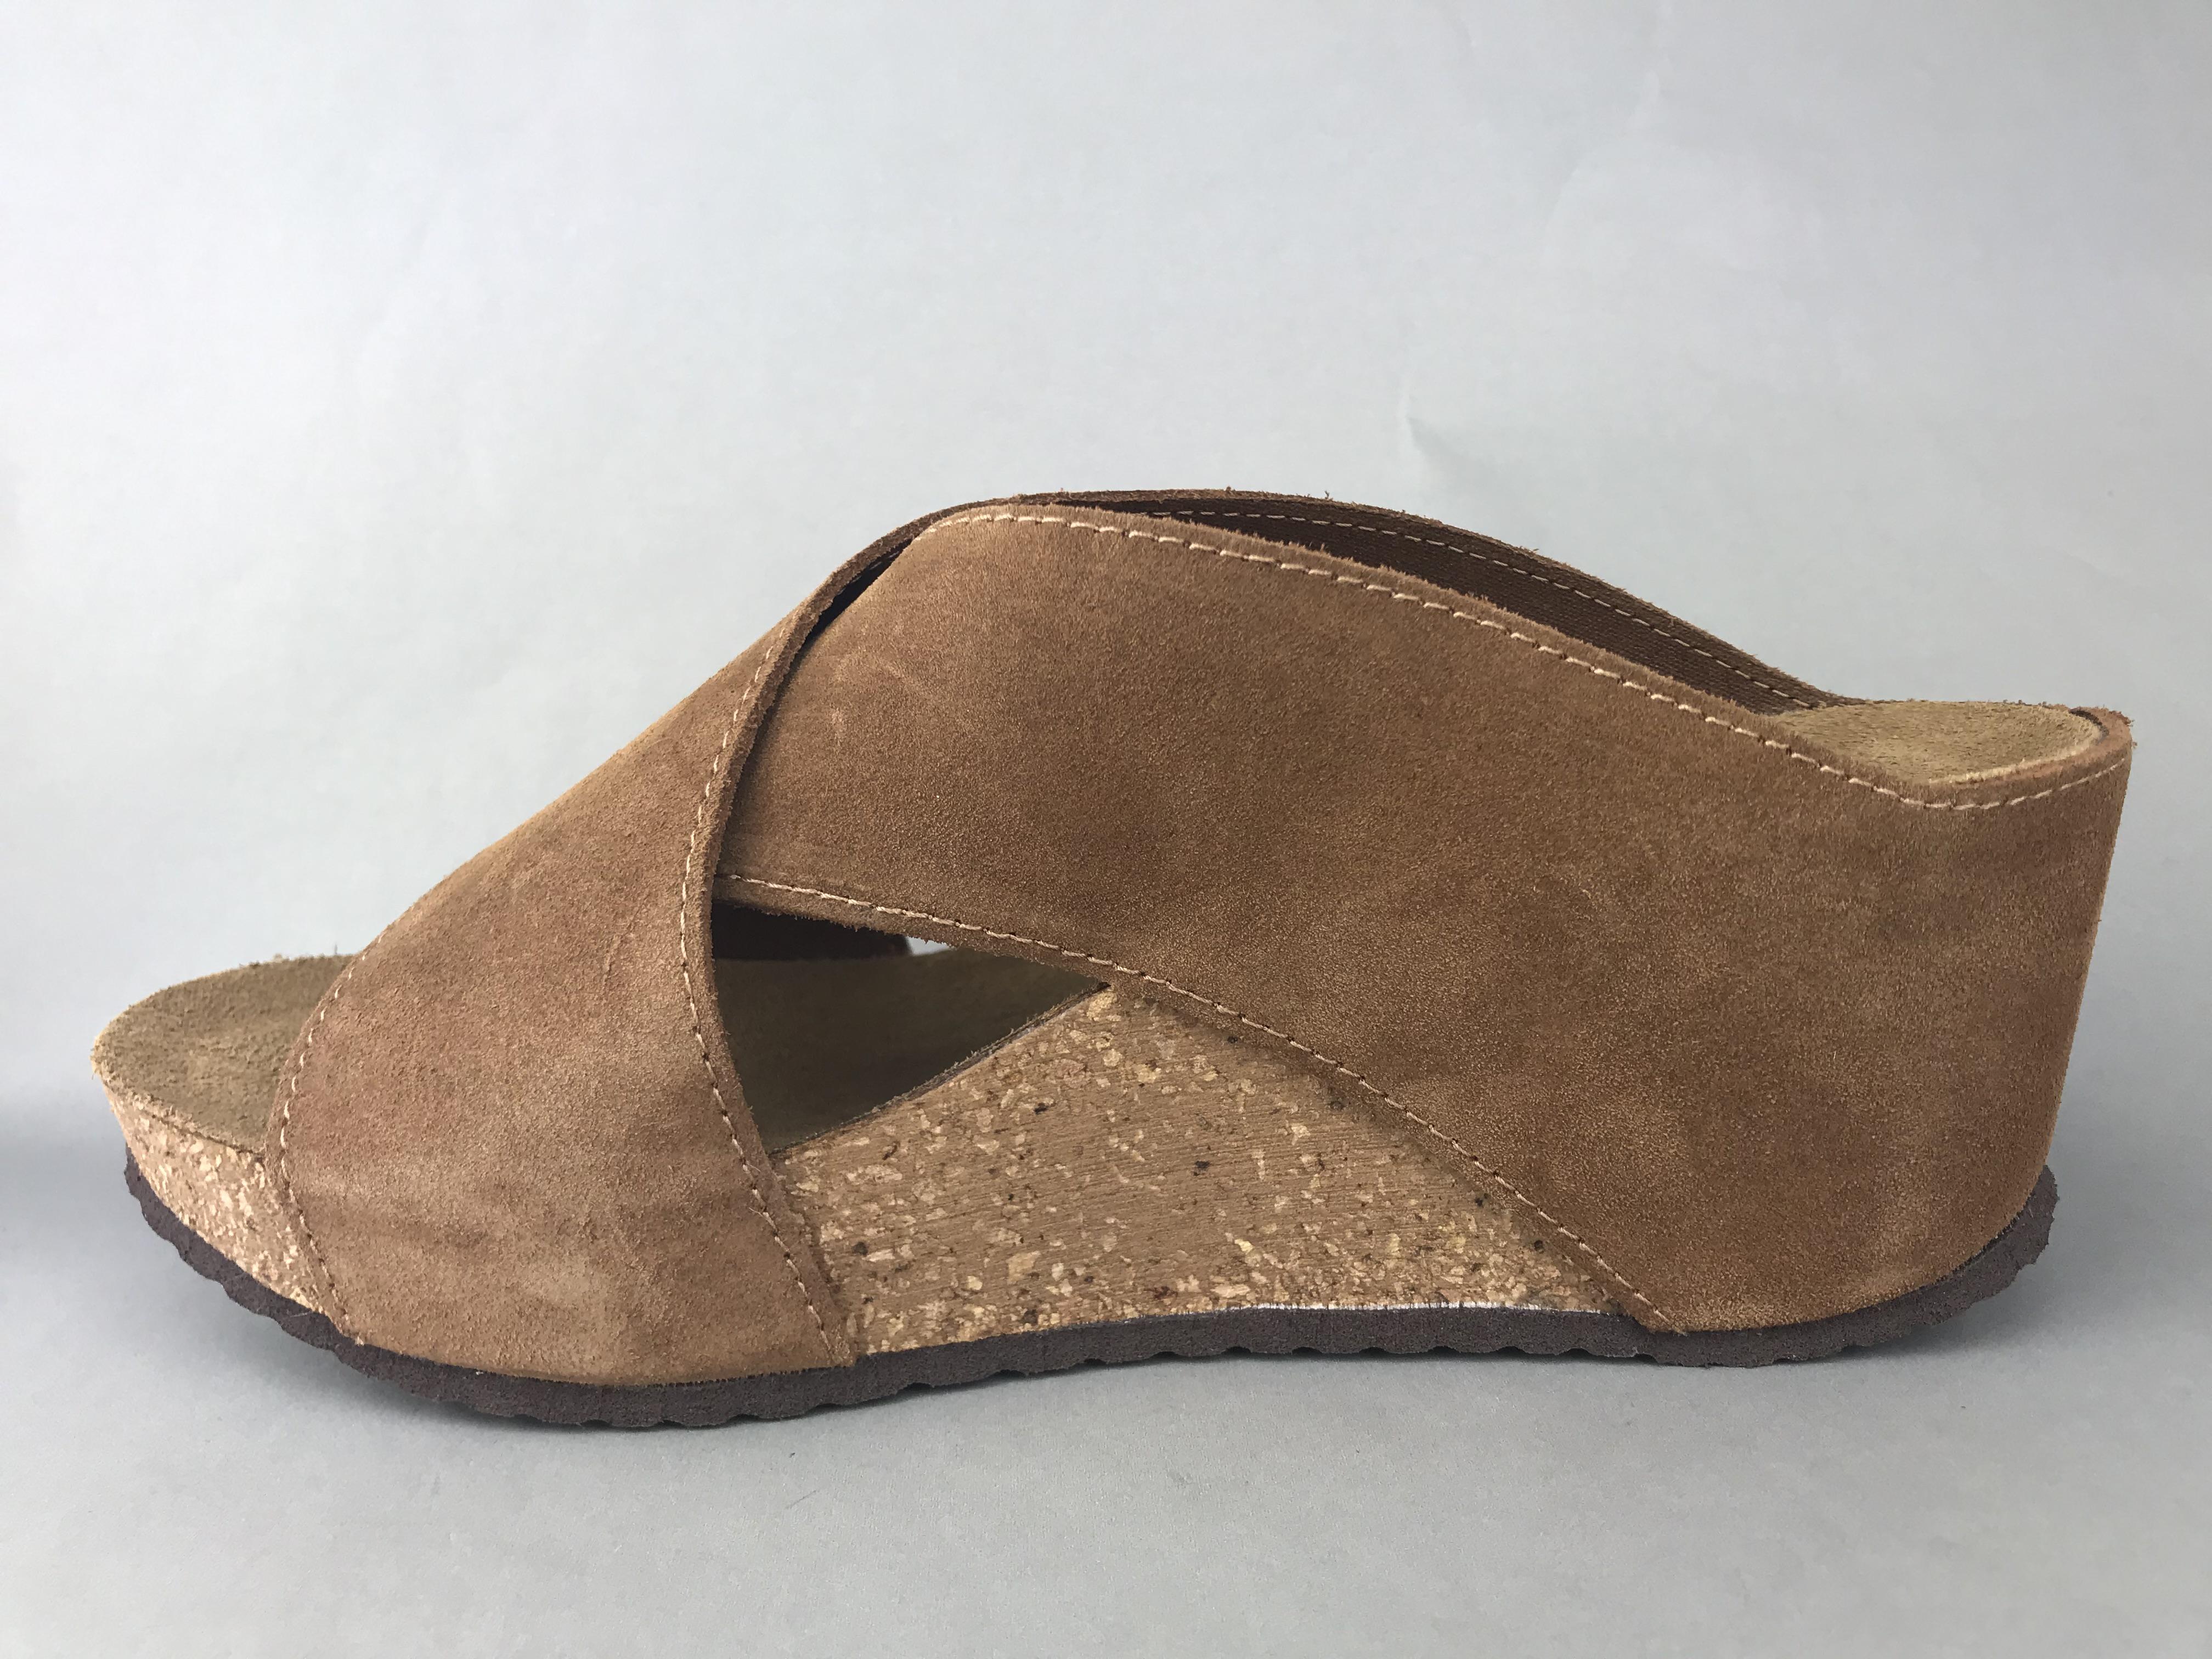 dc594d7f64b Copenhagen Shoes kork sandal m. kryds - brun - DAME - zjoos-hjoerring.dk